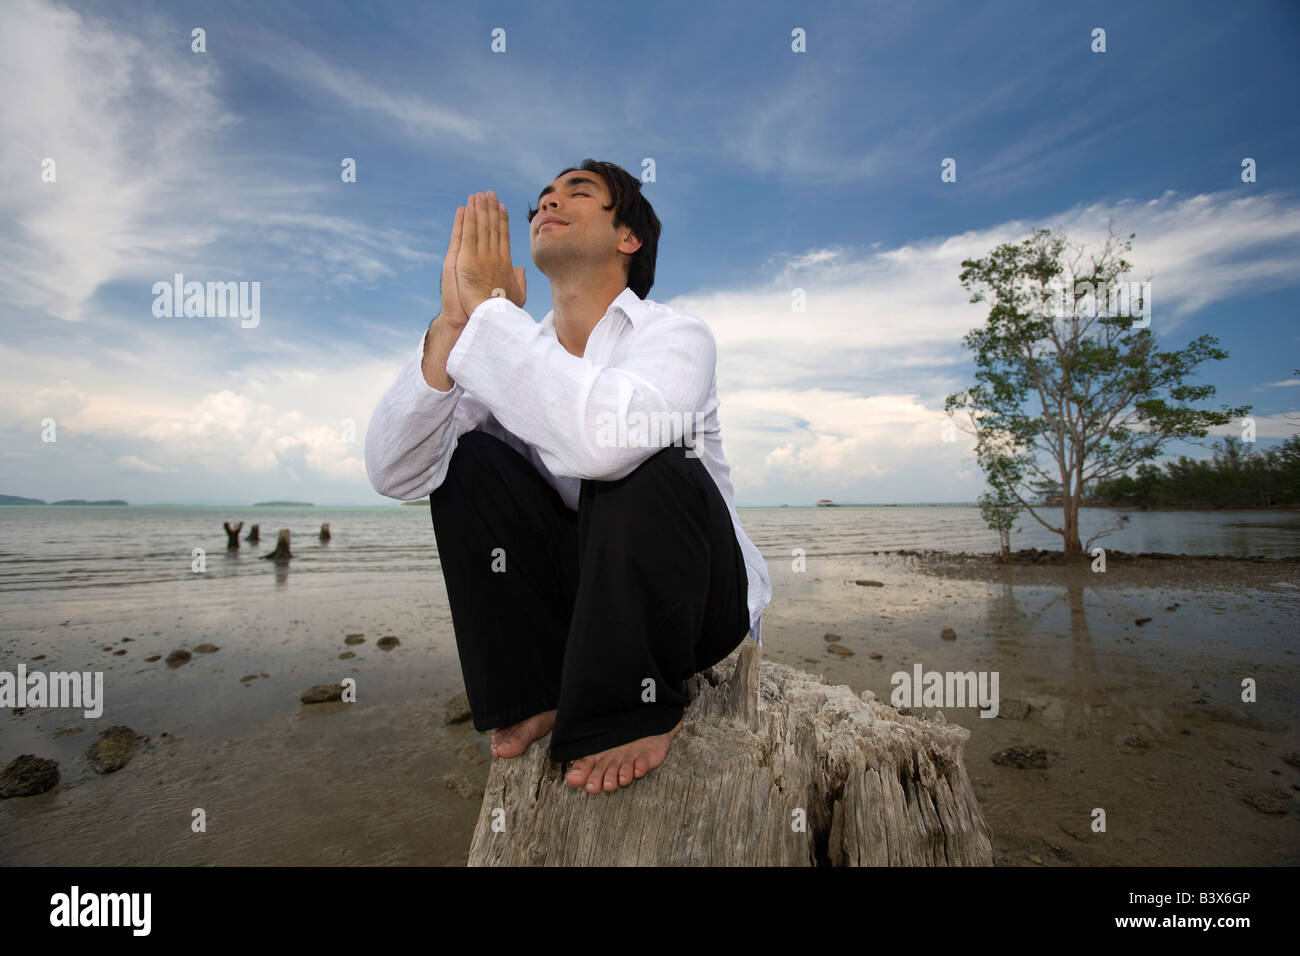 Man Asia Stockfotos & Man Asia Bilder - Alamy